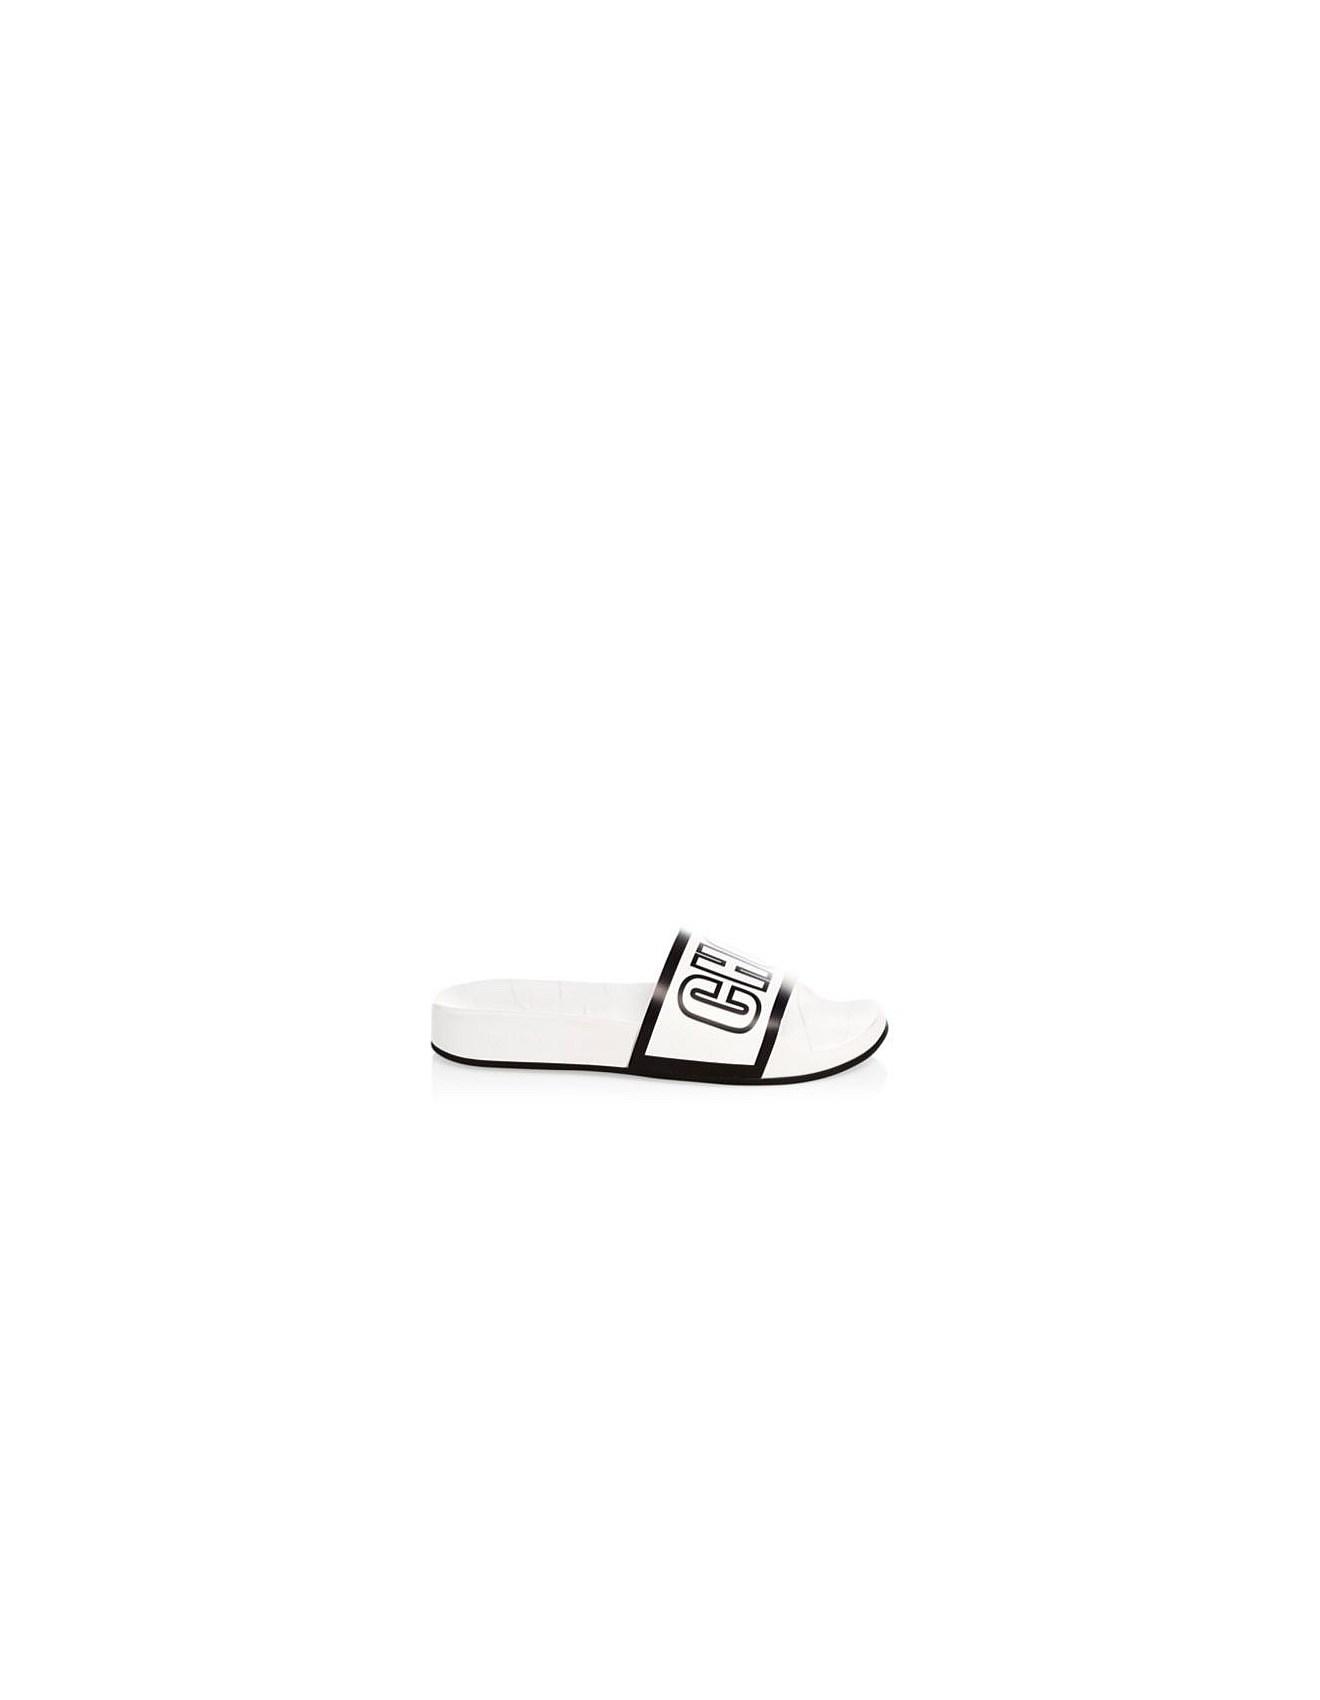 8687efc2f10 Jimmy Choo | Jimmy Choo Perfume & Shoes Online | David Jones - REY/F ...